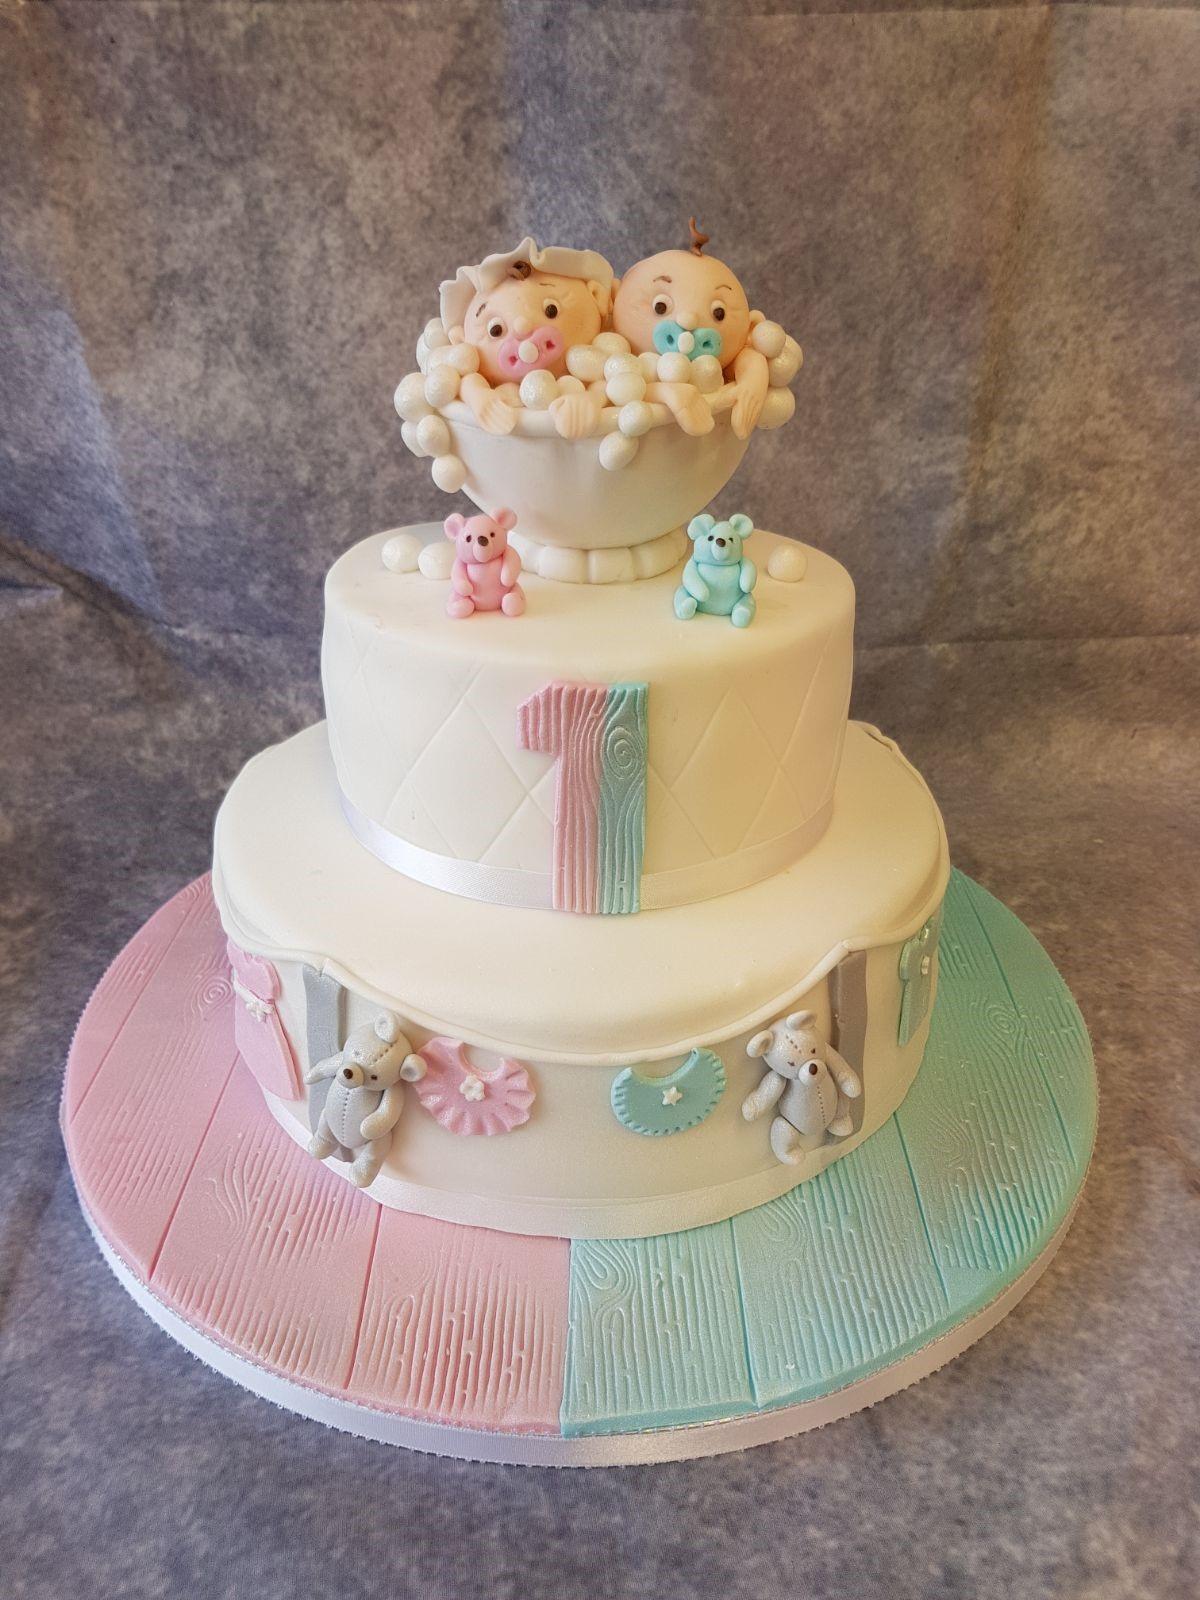 2 Tire Birthday Cake